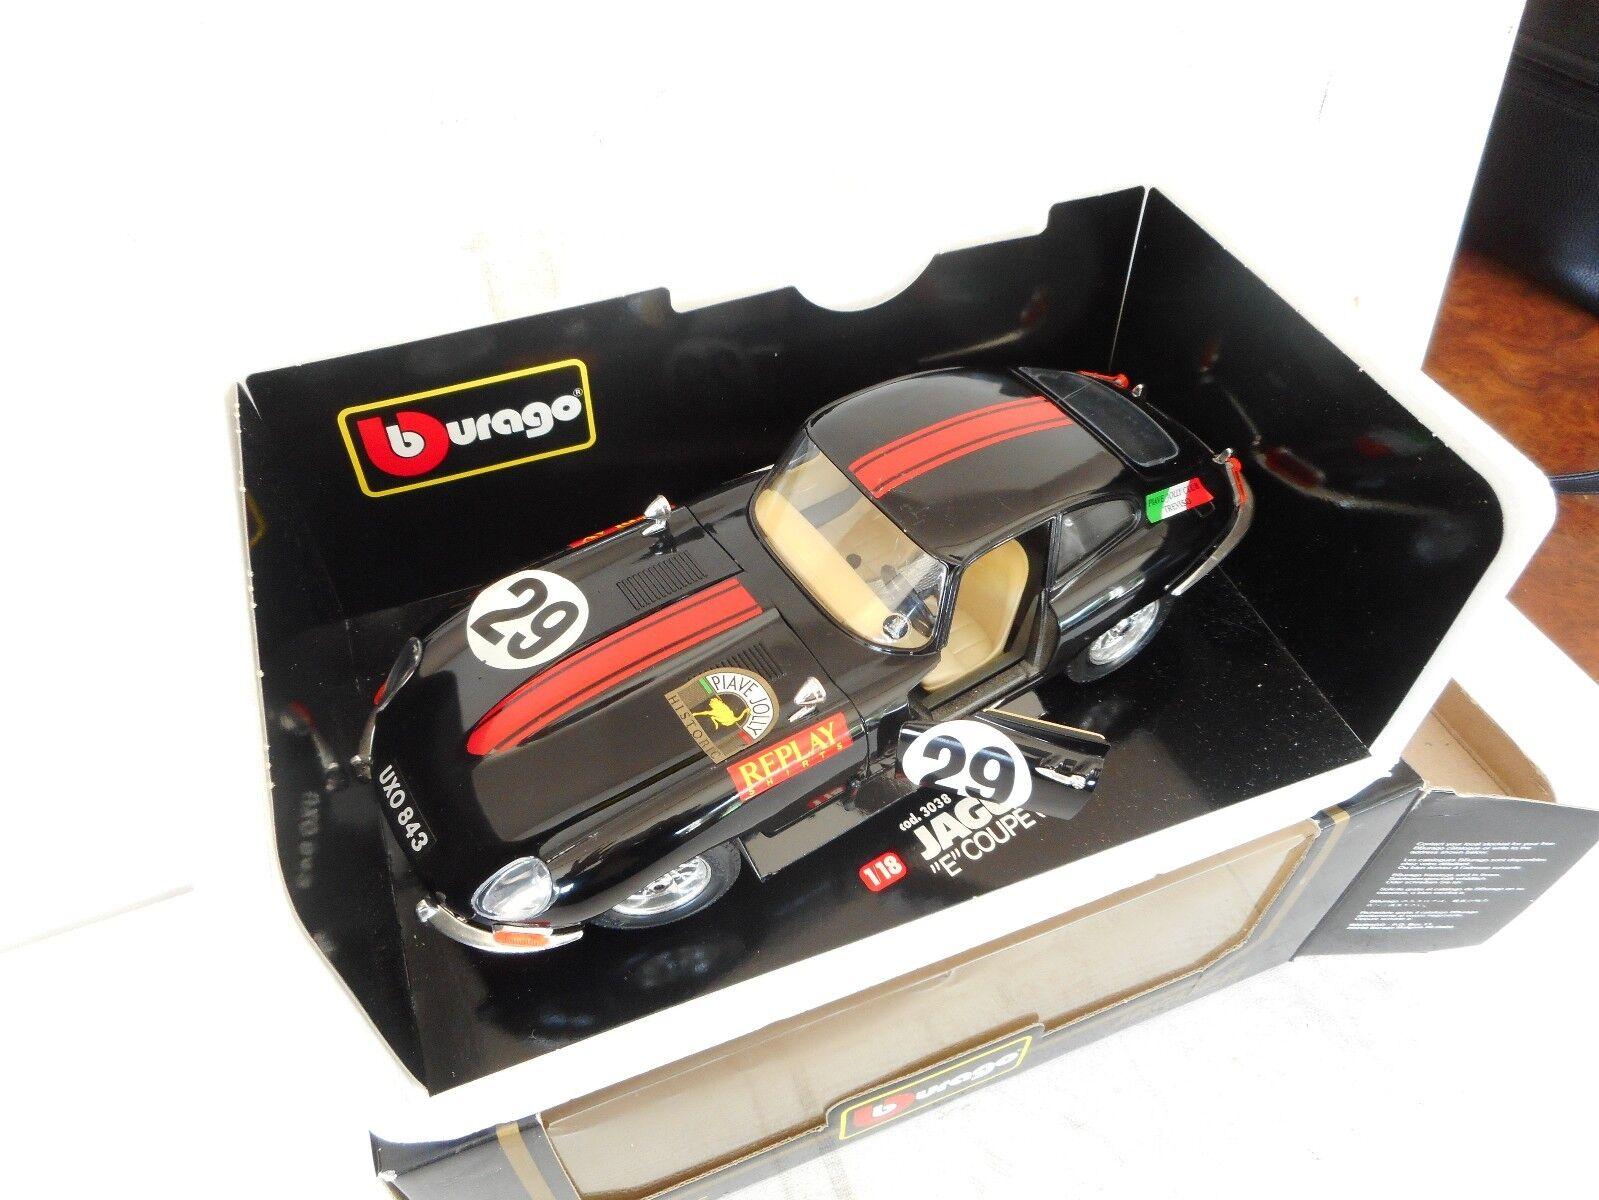 Burago 1 18 Scale Diecast  Jaguar E Type Coupe  1961  29 Race GOOD WITH BOX